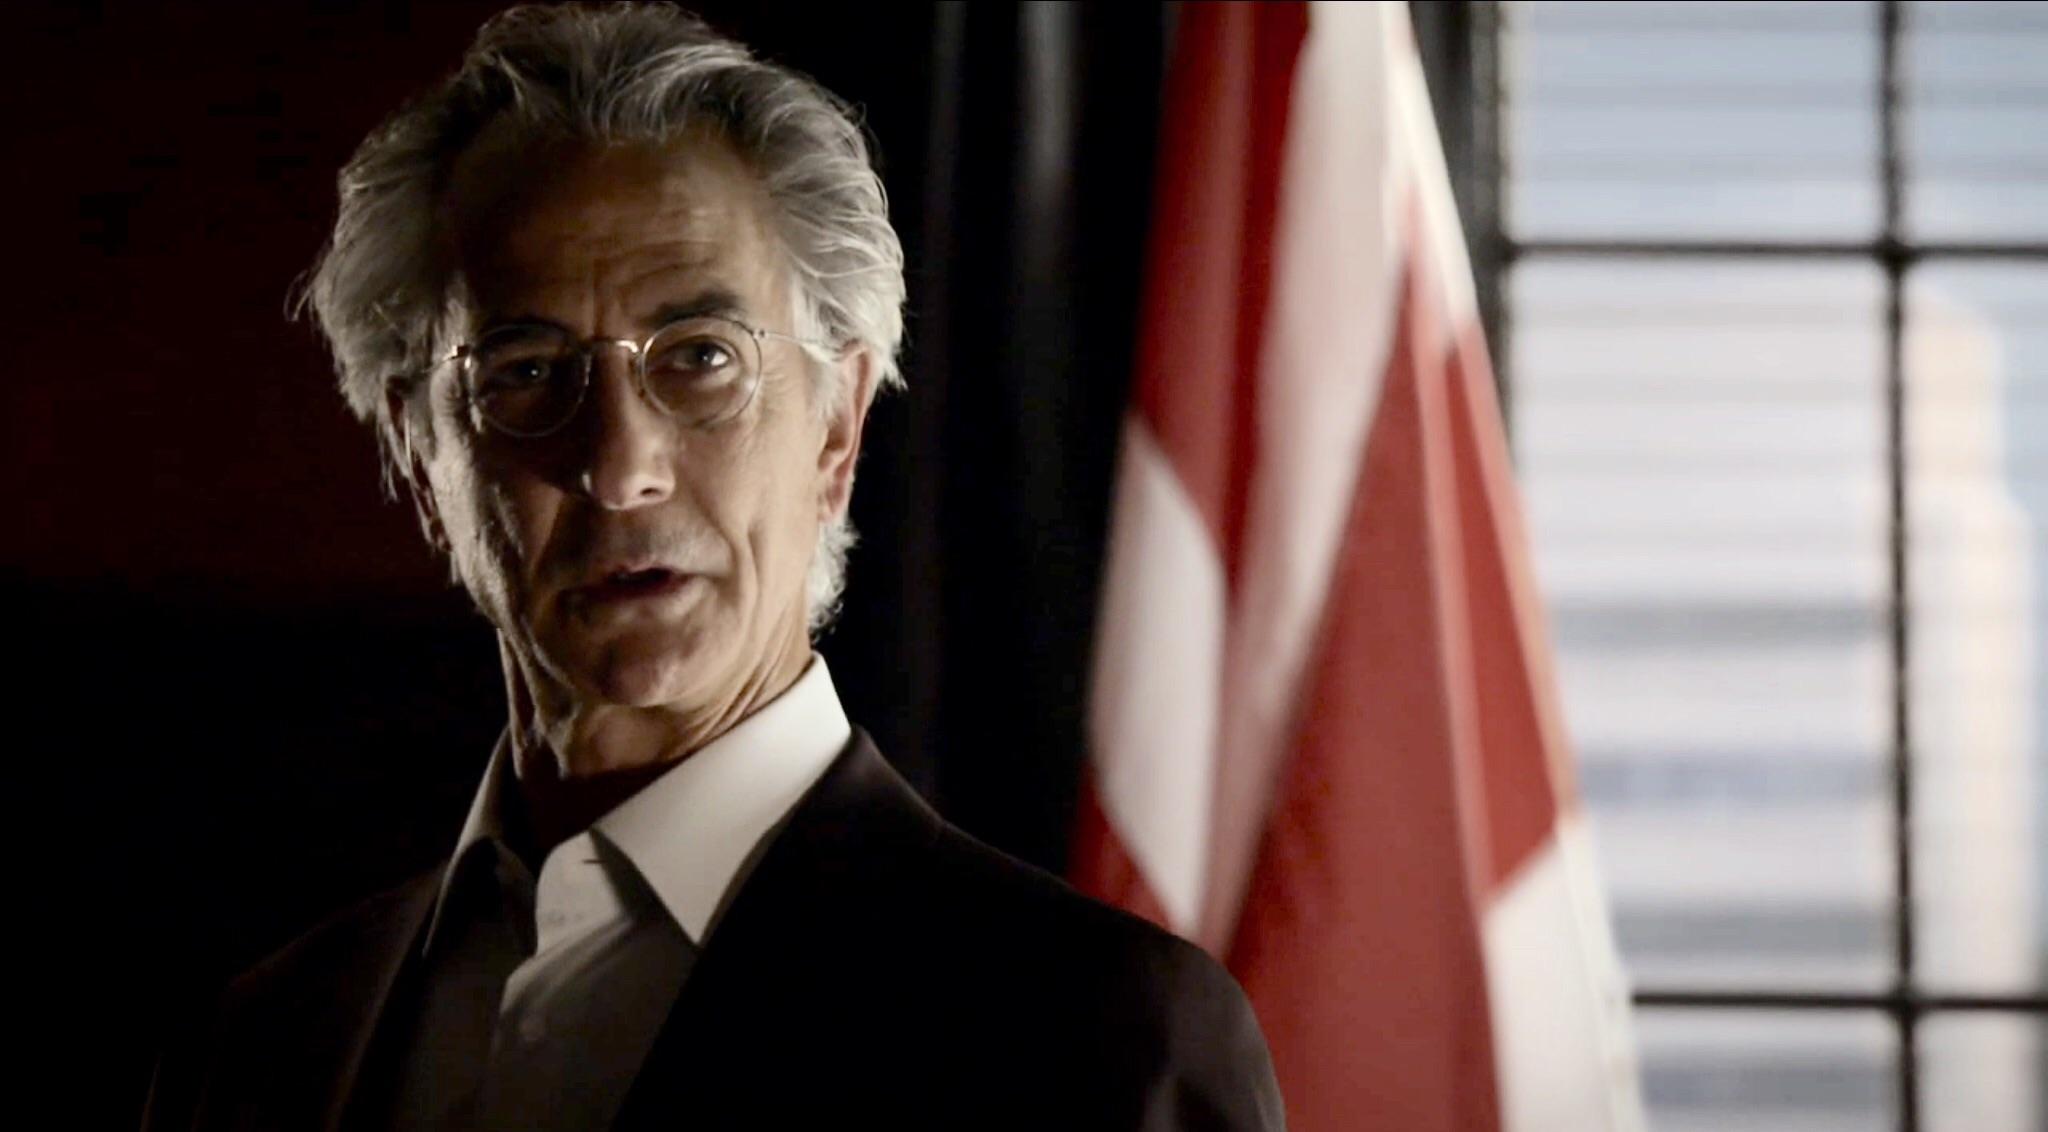 blacklist-season3-episode9-thedirector-preview-spoilers-air-date.jpg